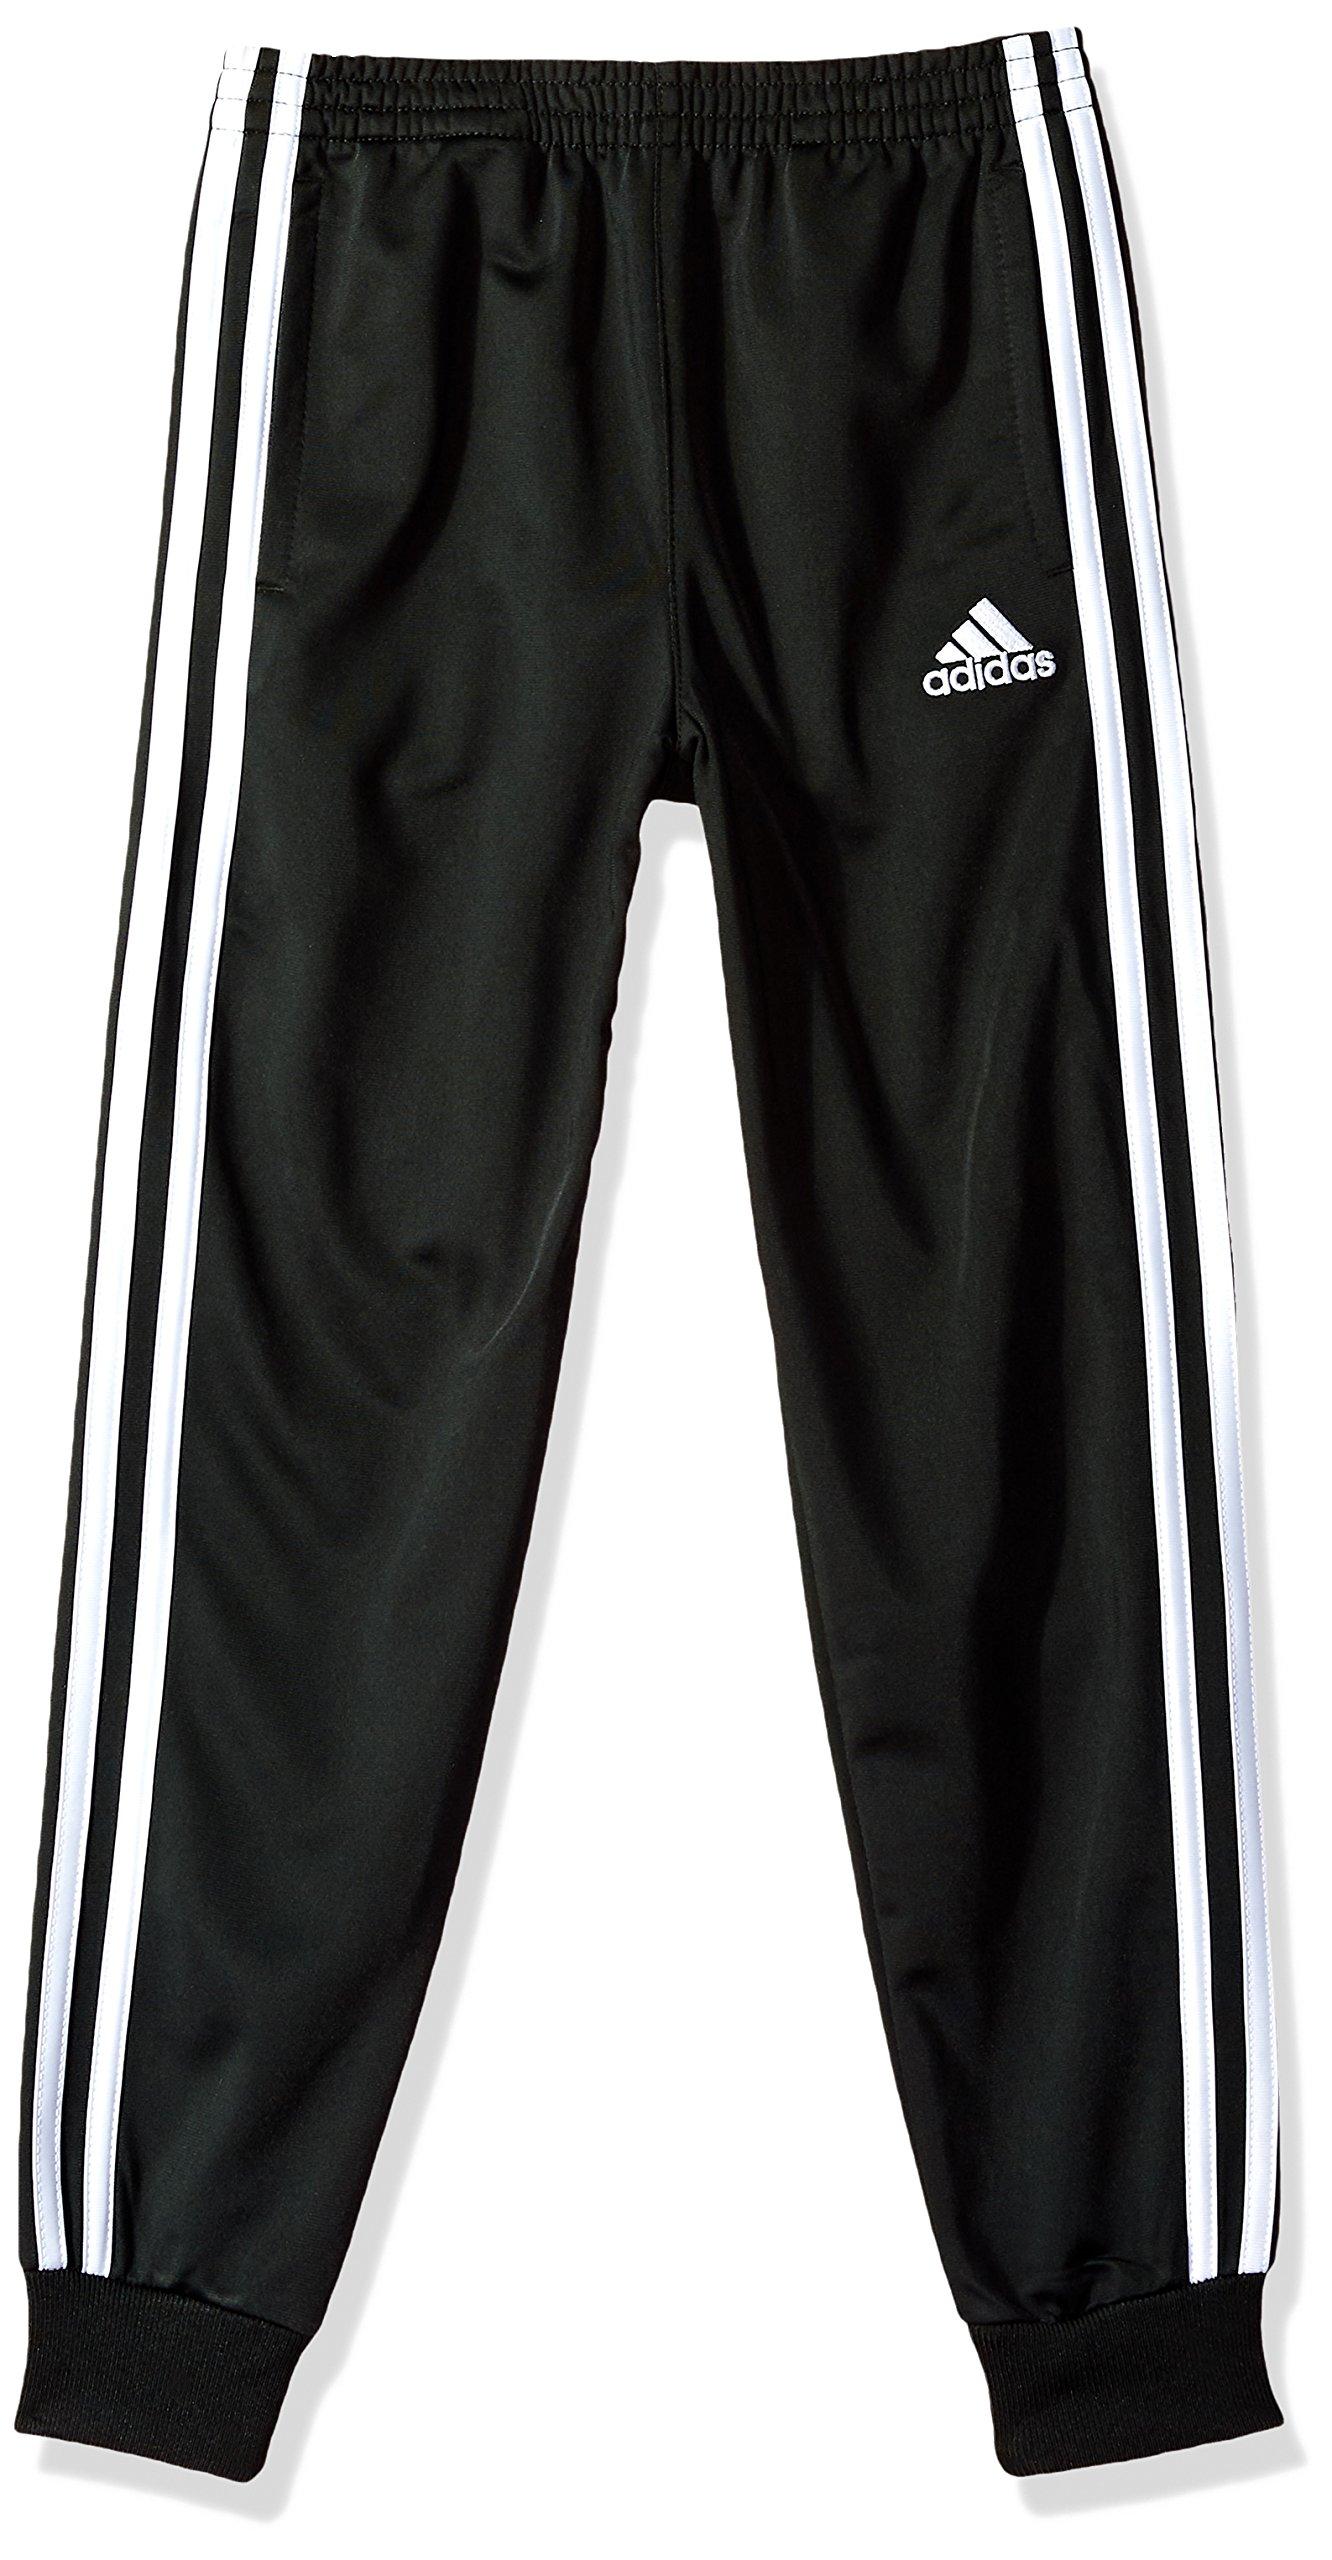 adidas Little Boys' Child Iconic Tricot Jogger, Black Adi, 7X